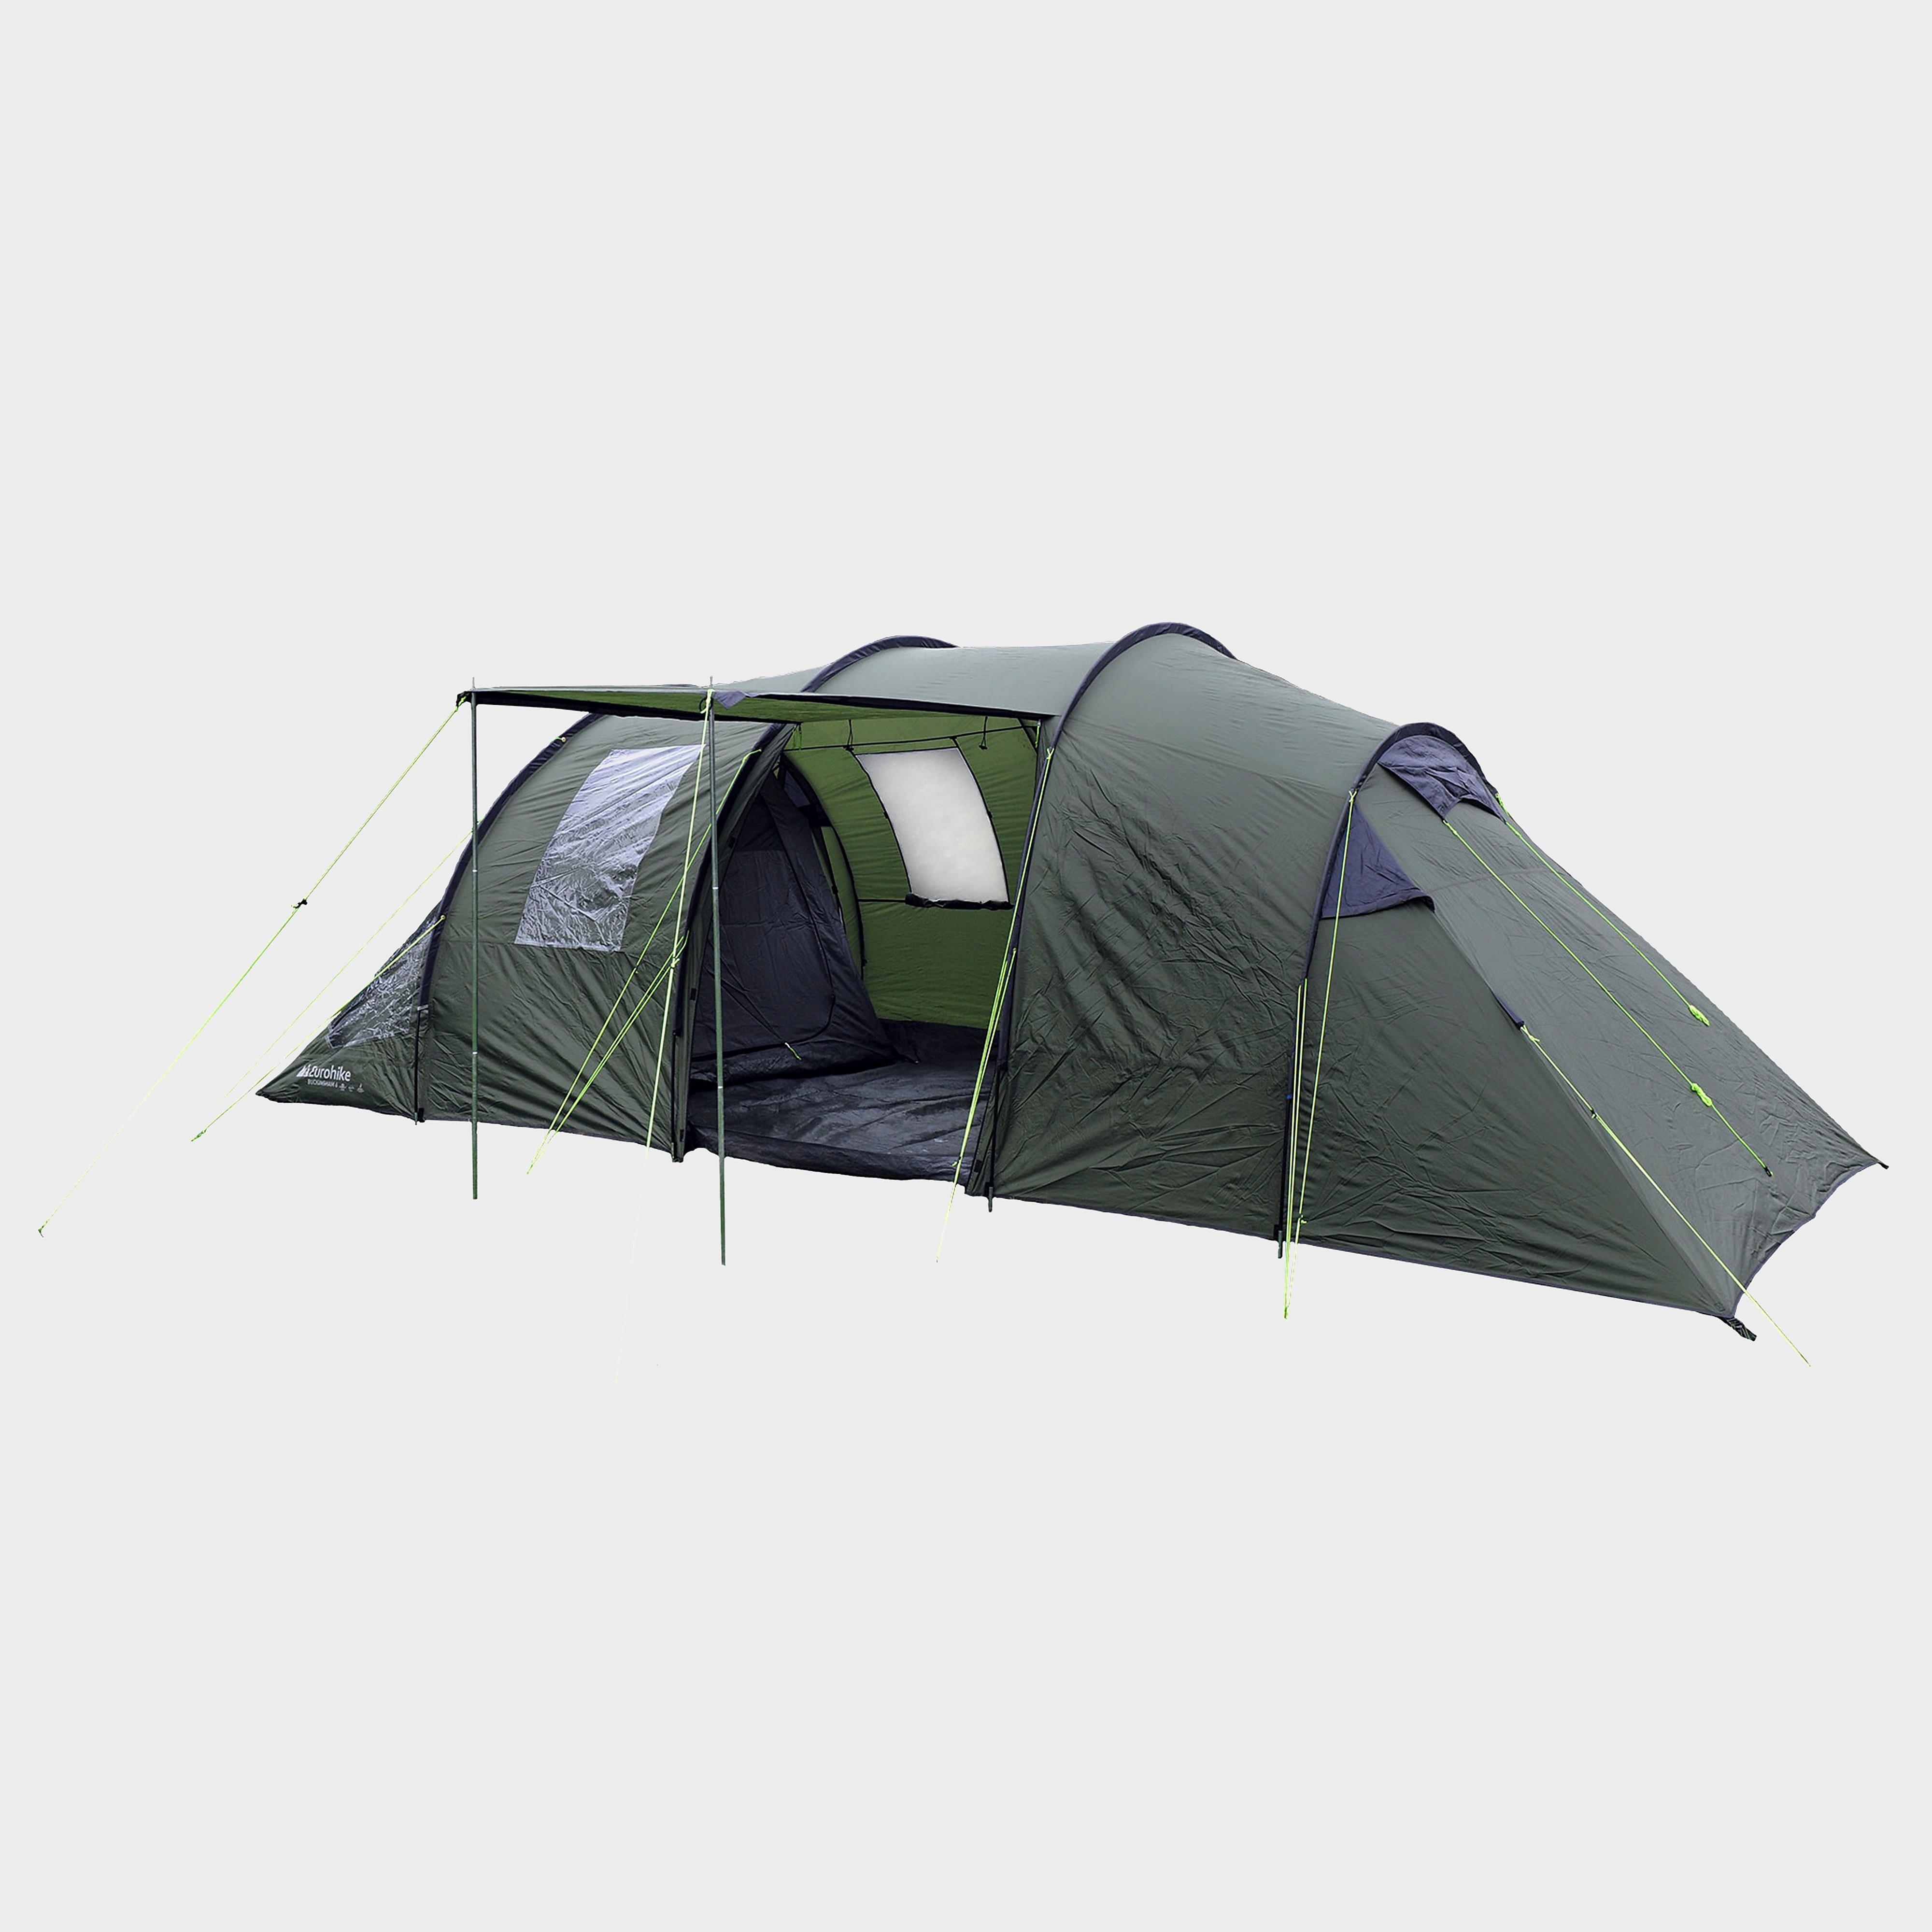 Eurohike Buckingham 6 Classic 6 Man Tent